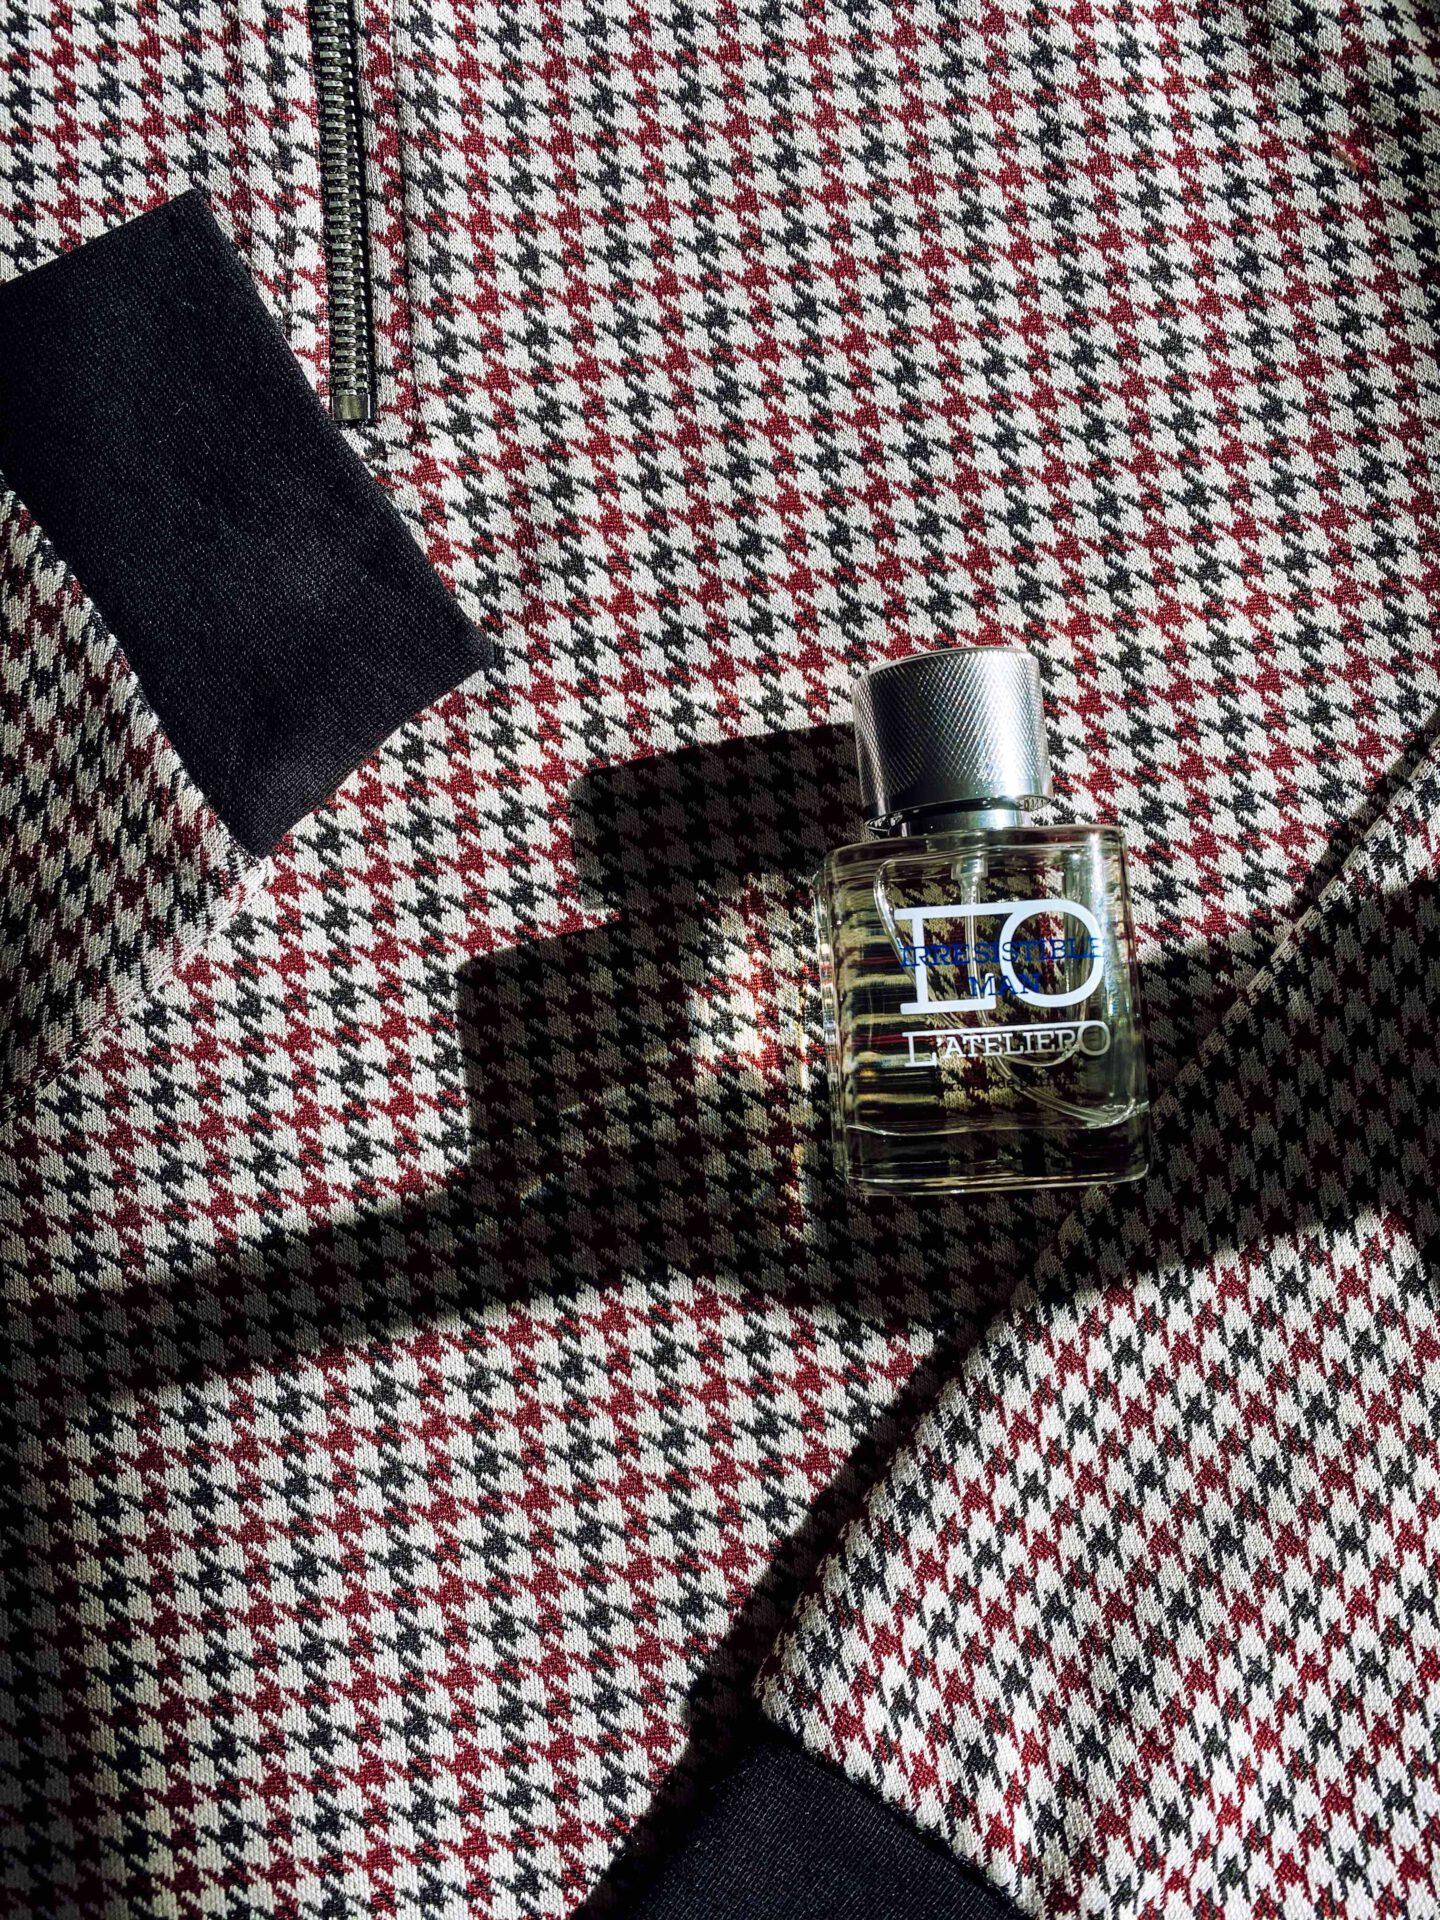 l'ateliero irresistible man duft manufaktur gentlemens journey